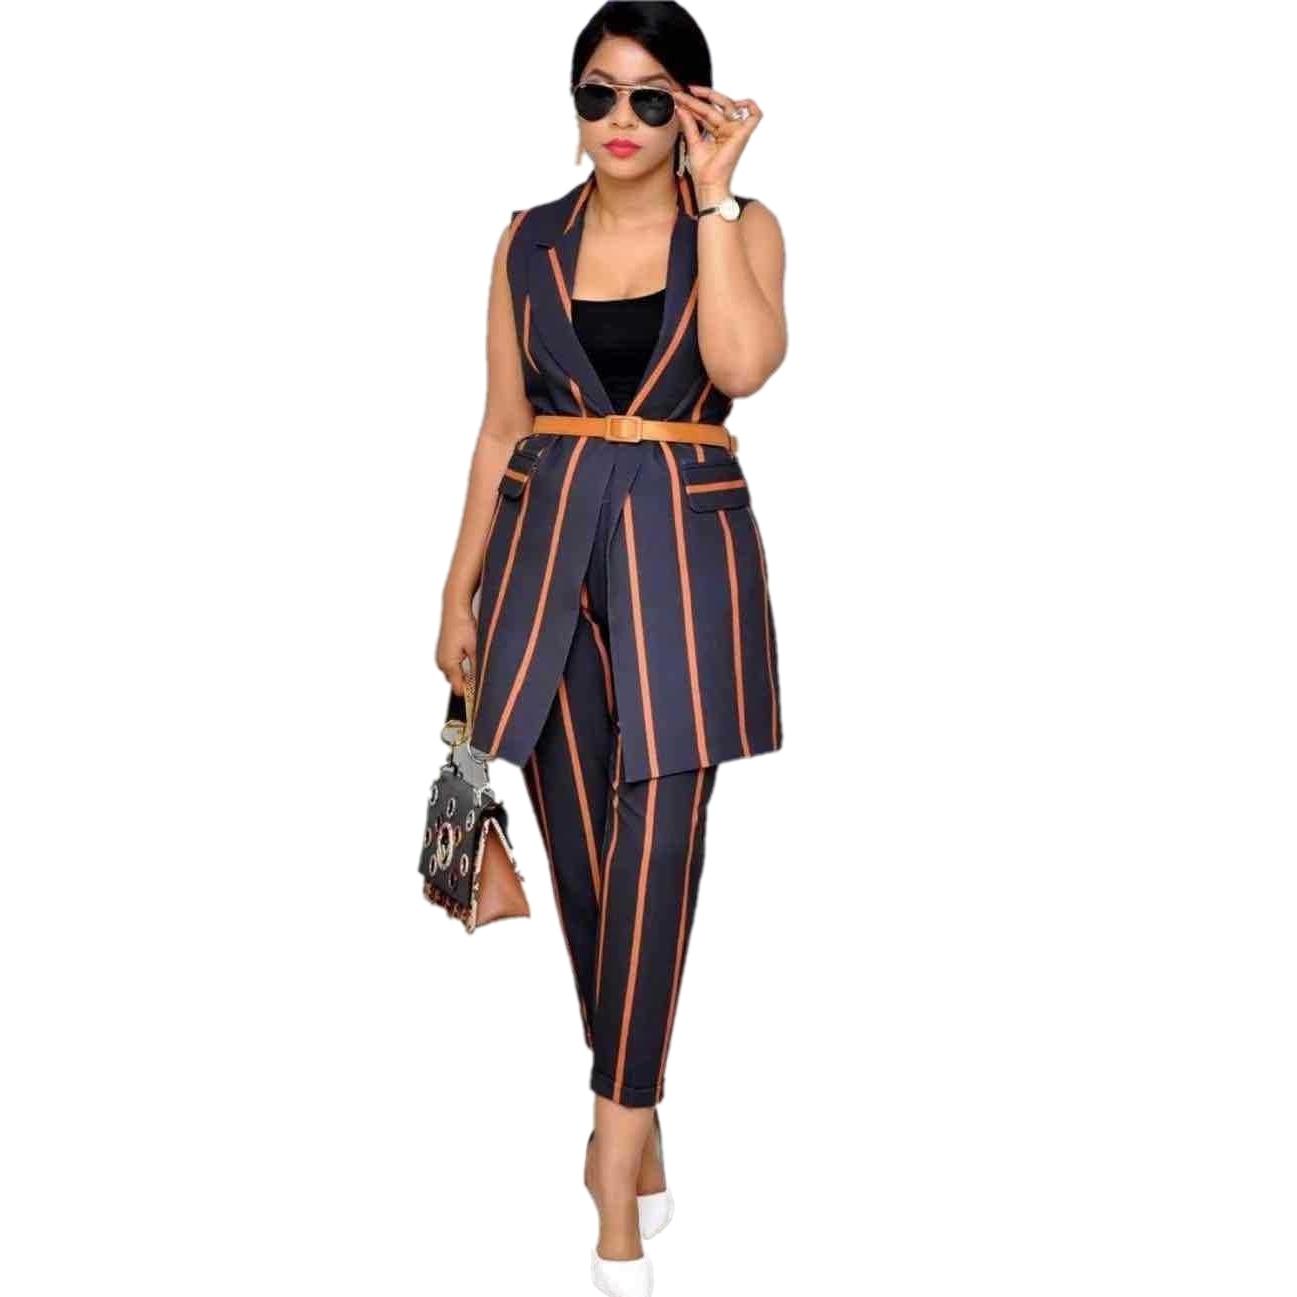 2 Pieces Set Sexy Spring Autumn Fashion Women Set Female Tops Stripe Print Sleeveless Vest Bodycon Stripe Pants Chic Suits